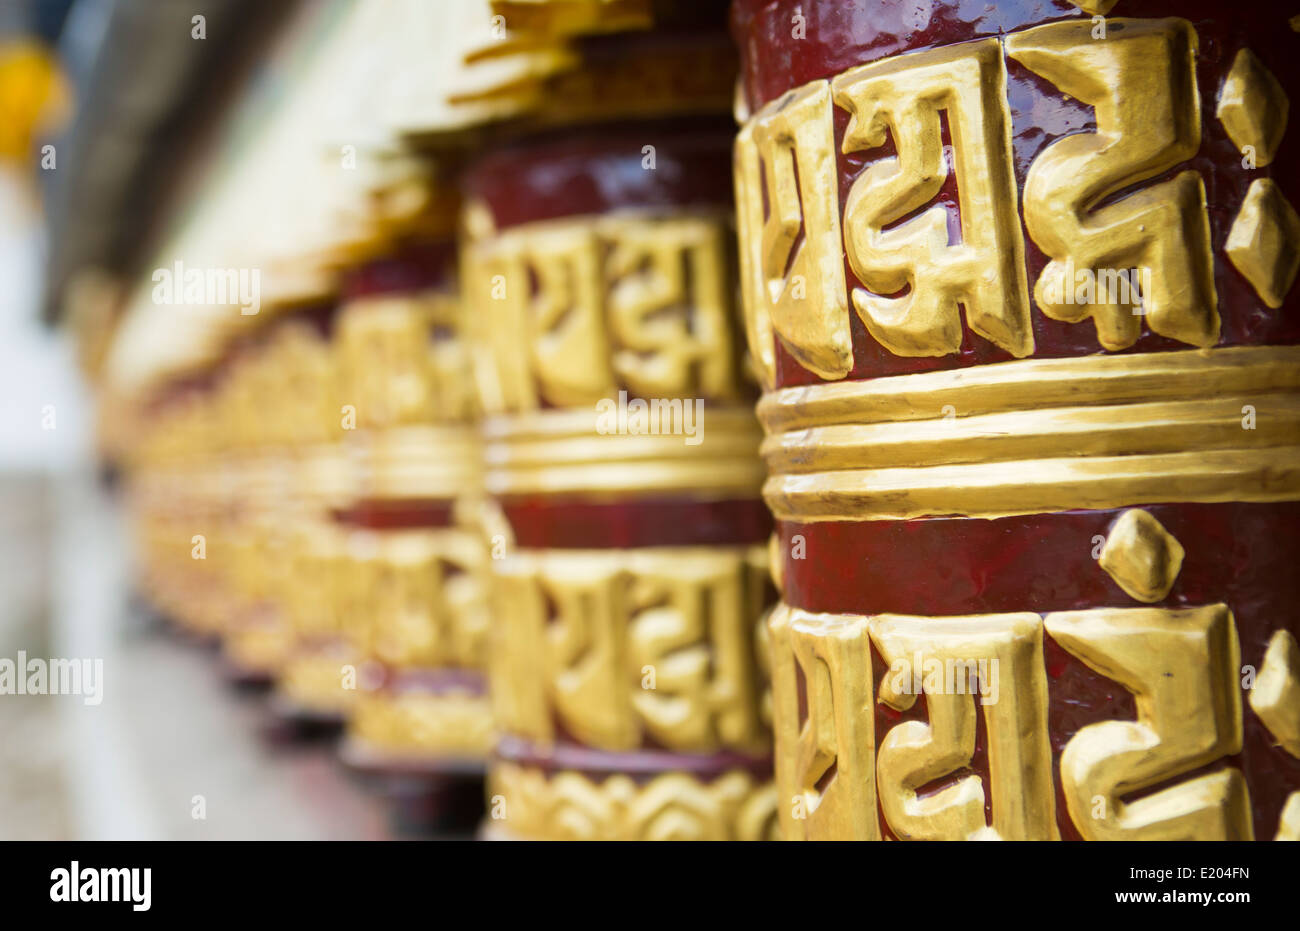 Nepal Prayer wheels in the village of Khumjung Solukhumbu, remote, Mt Everest, Himalayas - Stock Image